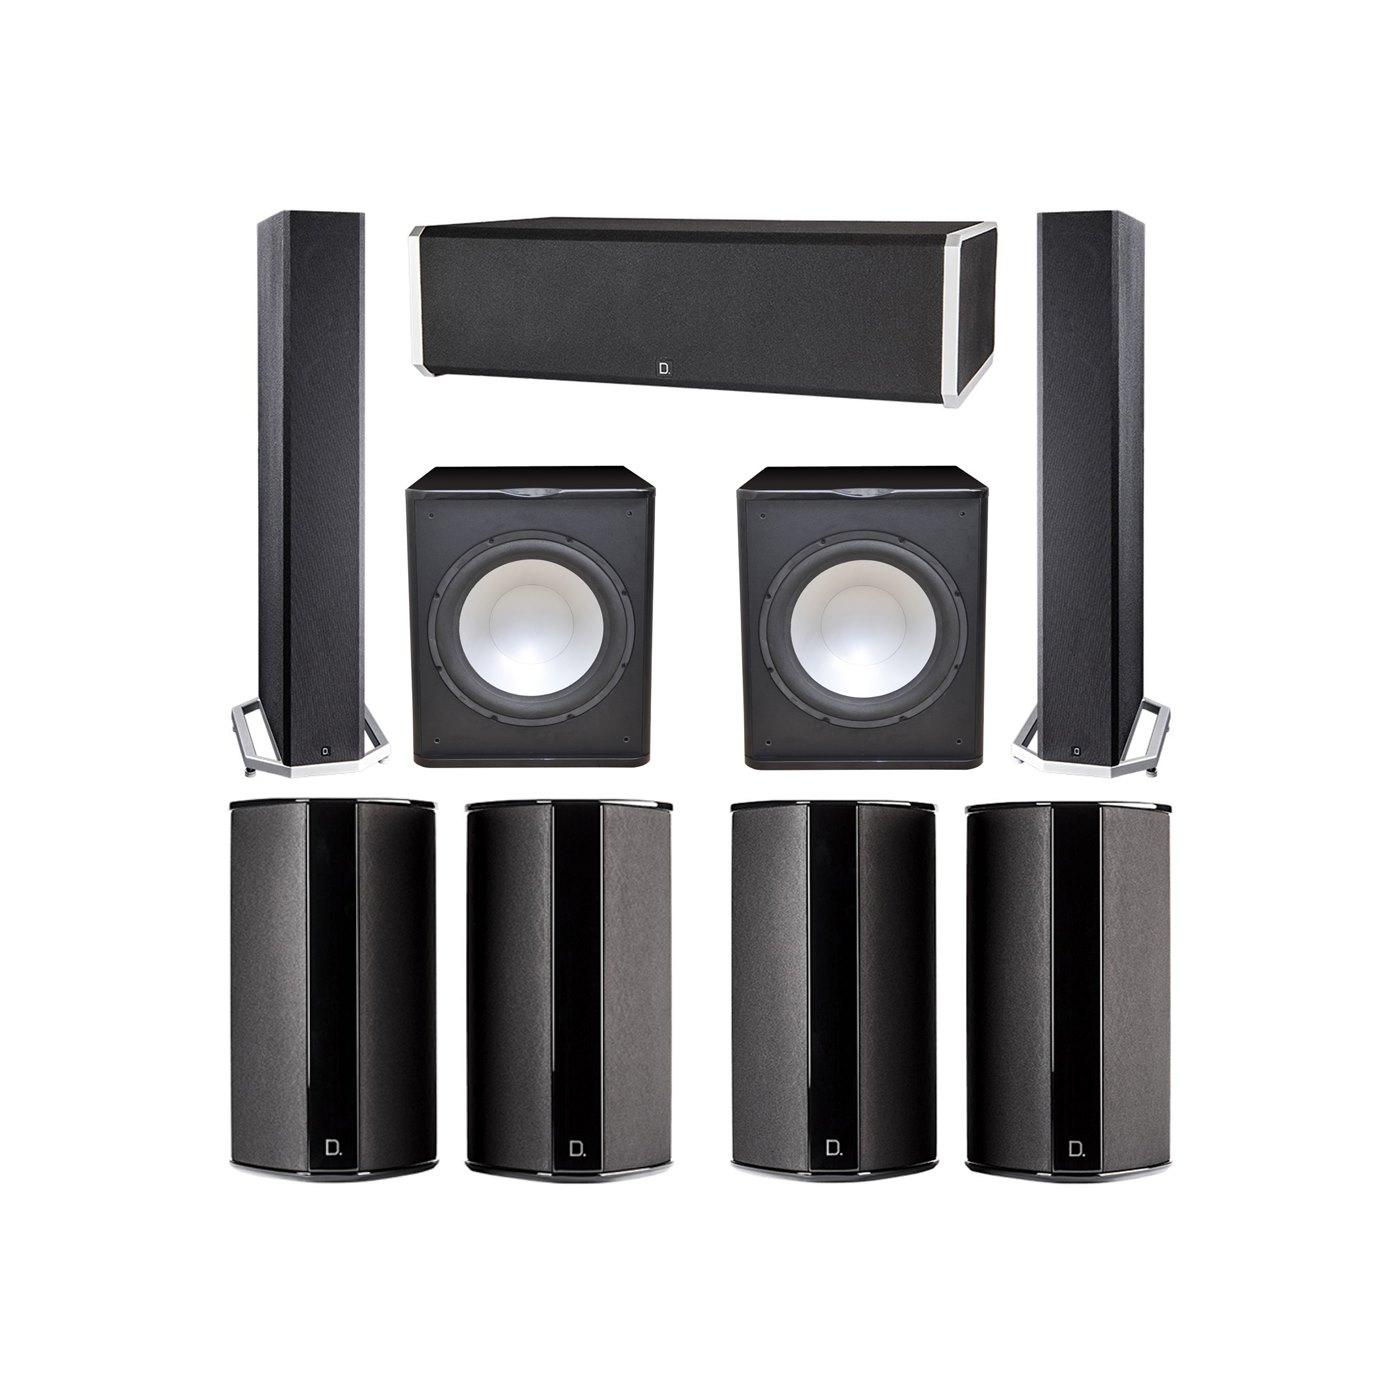 Definitive Technology 7.2 System with 2 BP9040 Tower Speakers, 1 CS9060 Center Channel Speaker, 4 SR9080 Surround Speaker, 2 Premier Acoustic PA-150 Subwoofer